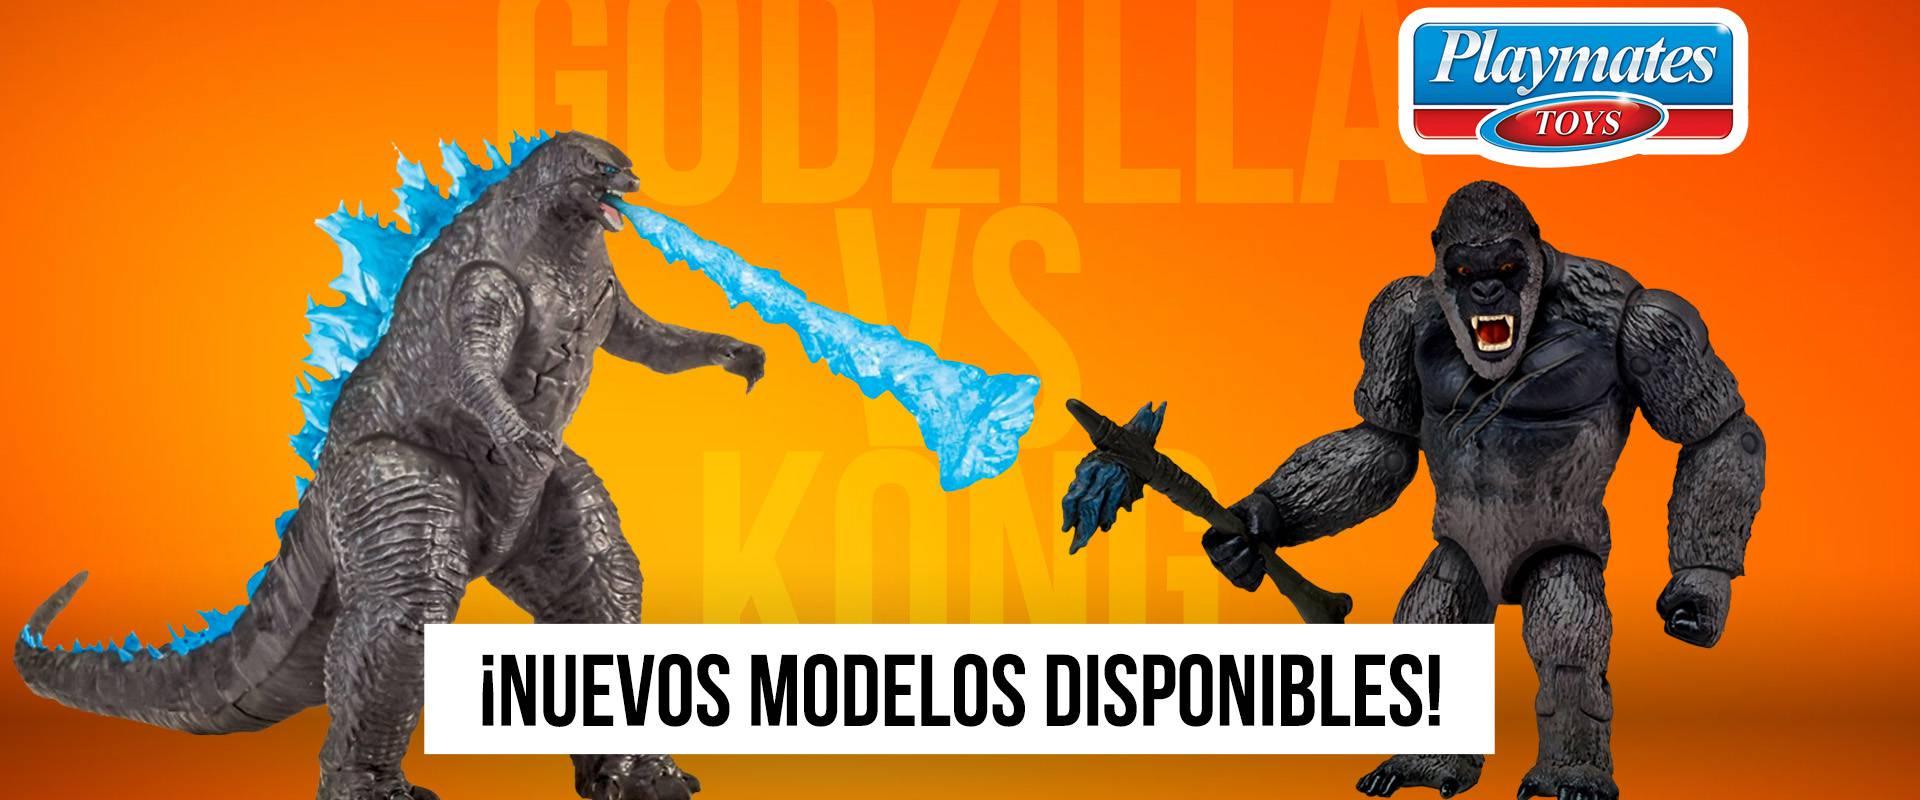 Godzilla vs King Kong Playmates